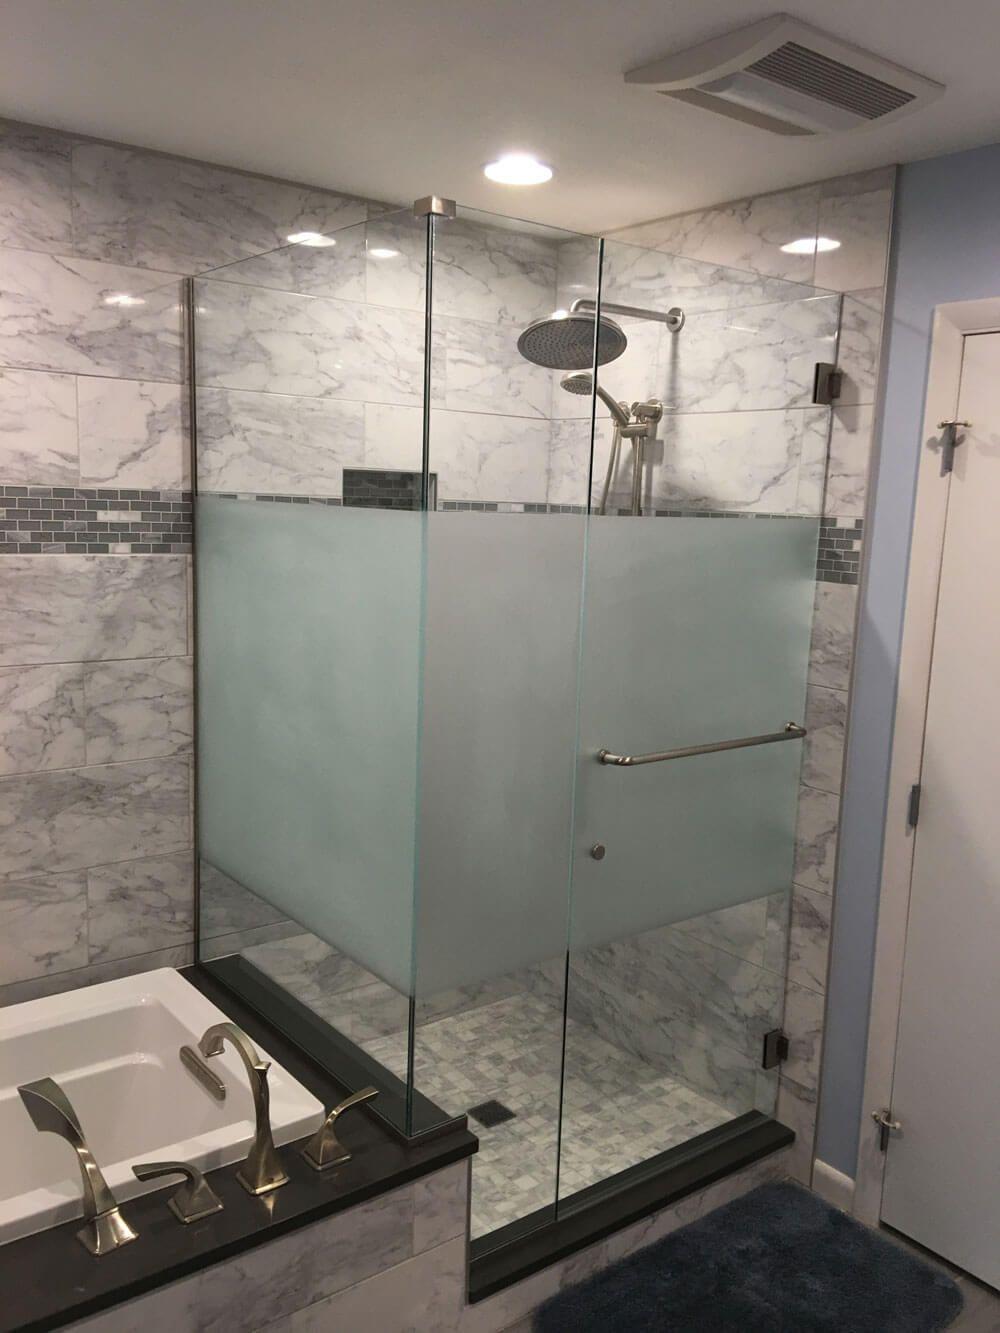 Privacy Glass Shower Doors | Bathrooms | Pinterest | Glass shower ...